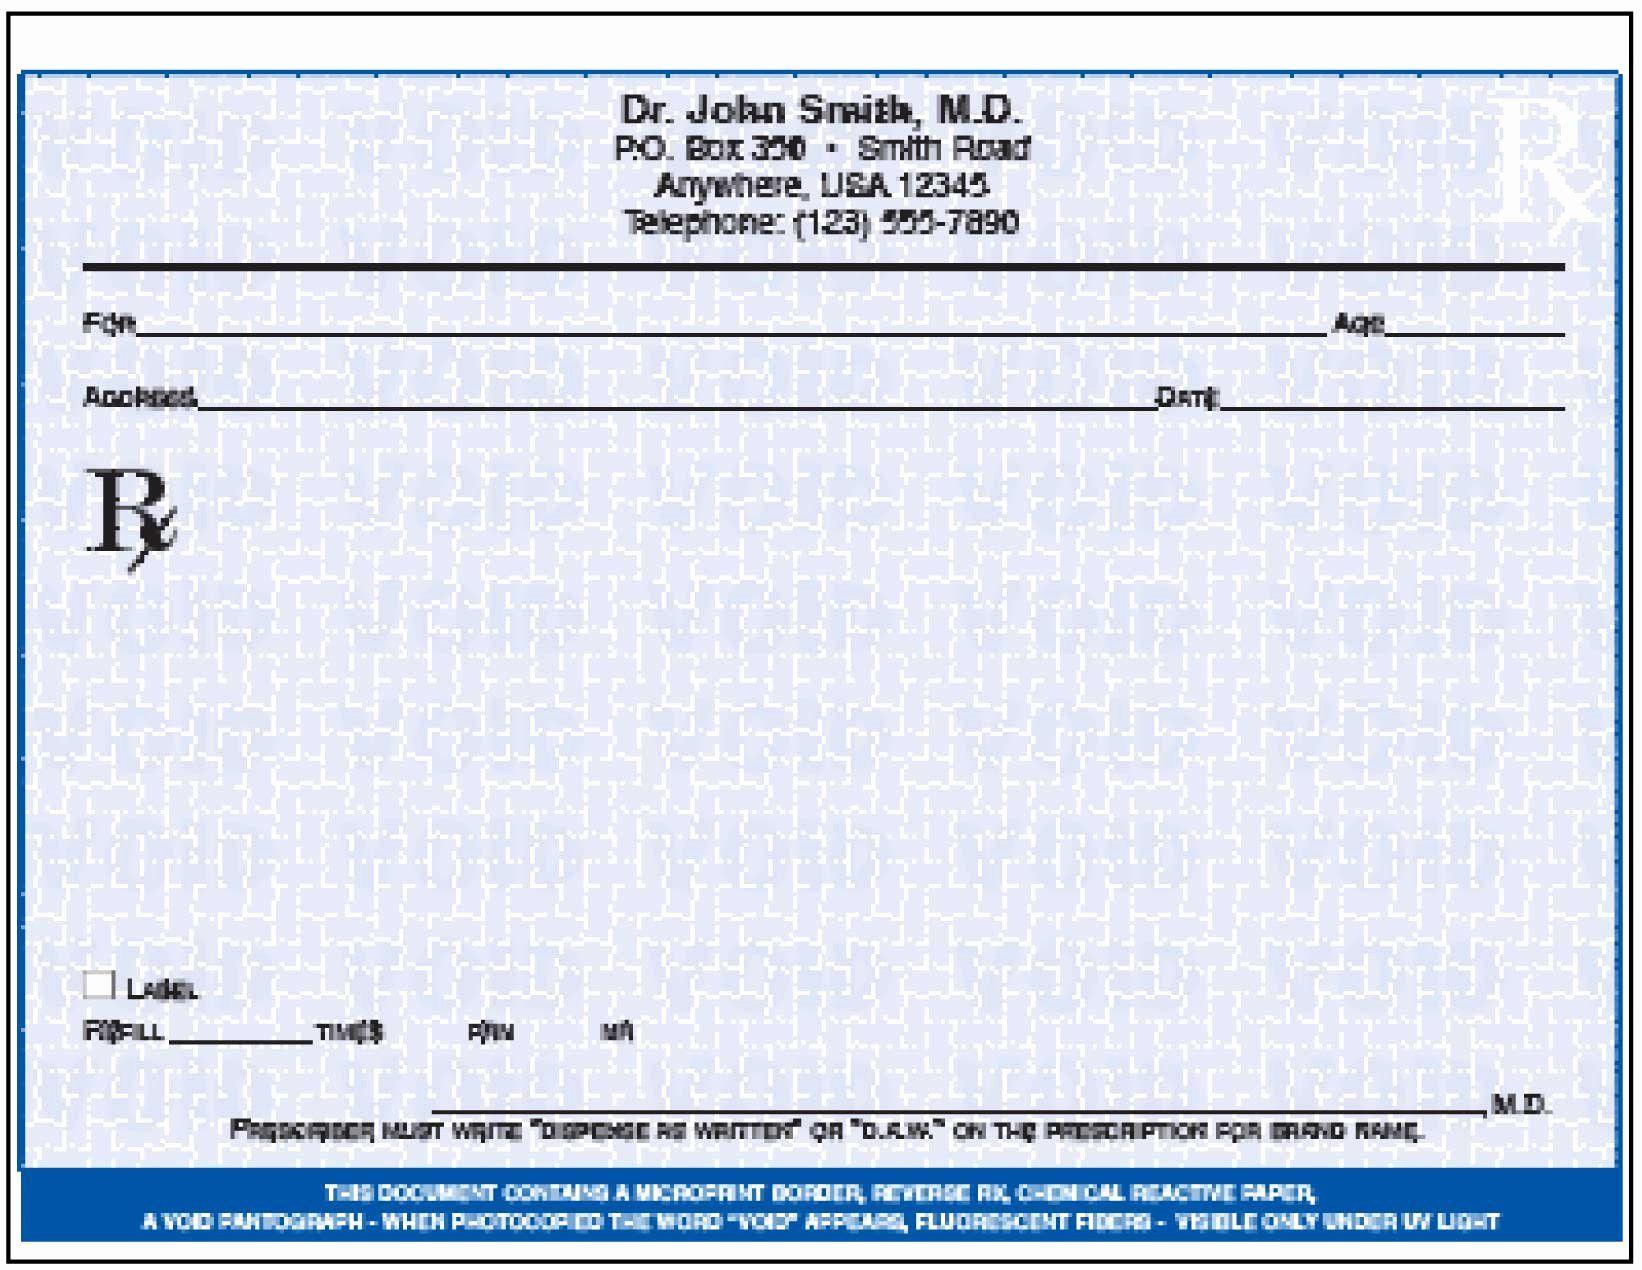 Printable Fake Prescription Forms Best Of Templates Clipart Pad Paper Pencil And In Color Microsoft Word Free Prescription Pad Medical Prescription